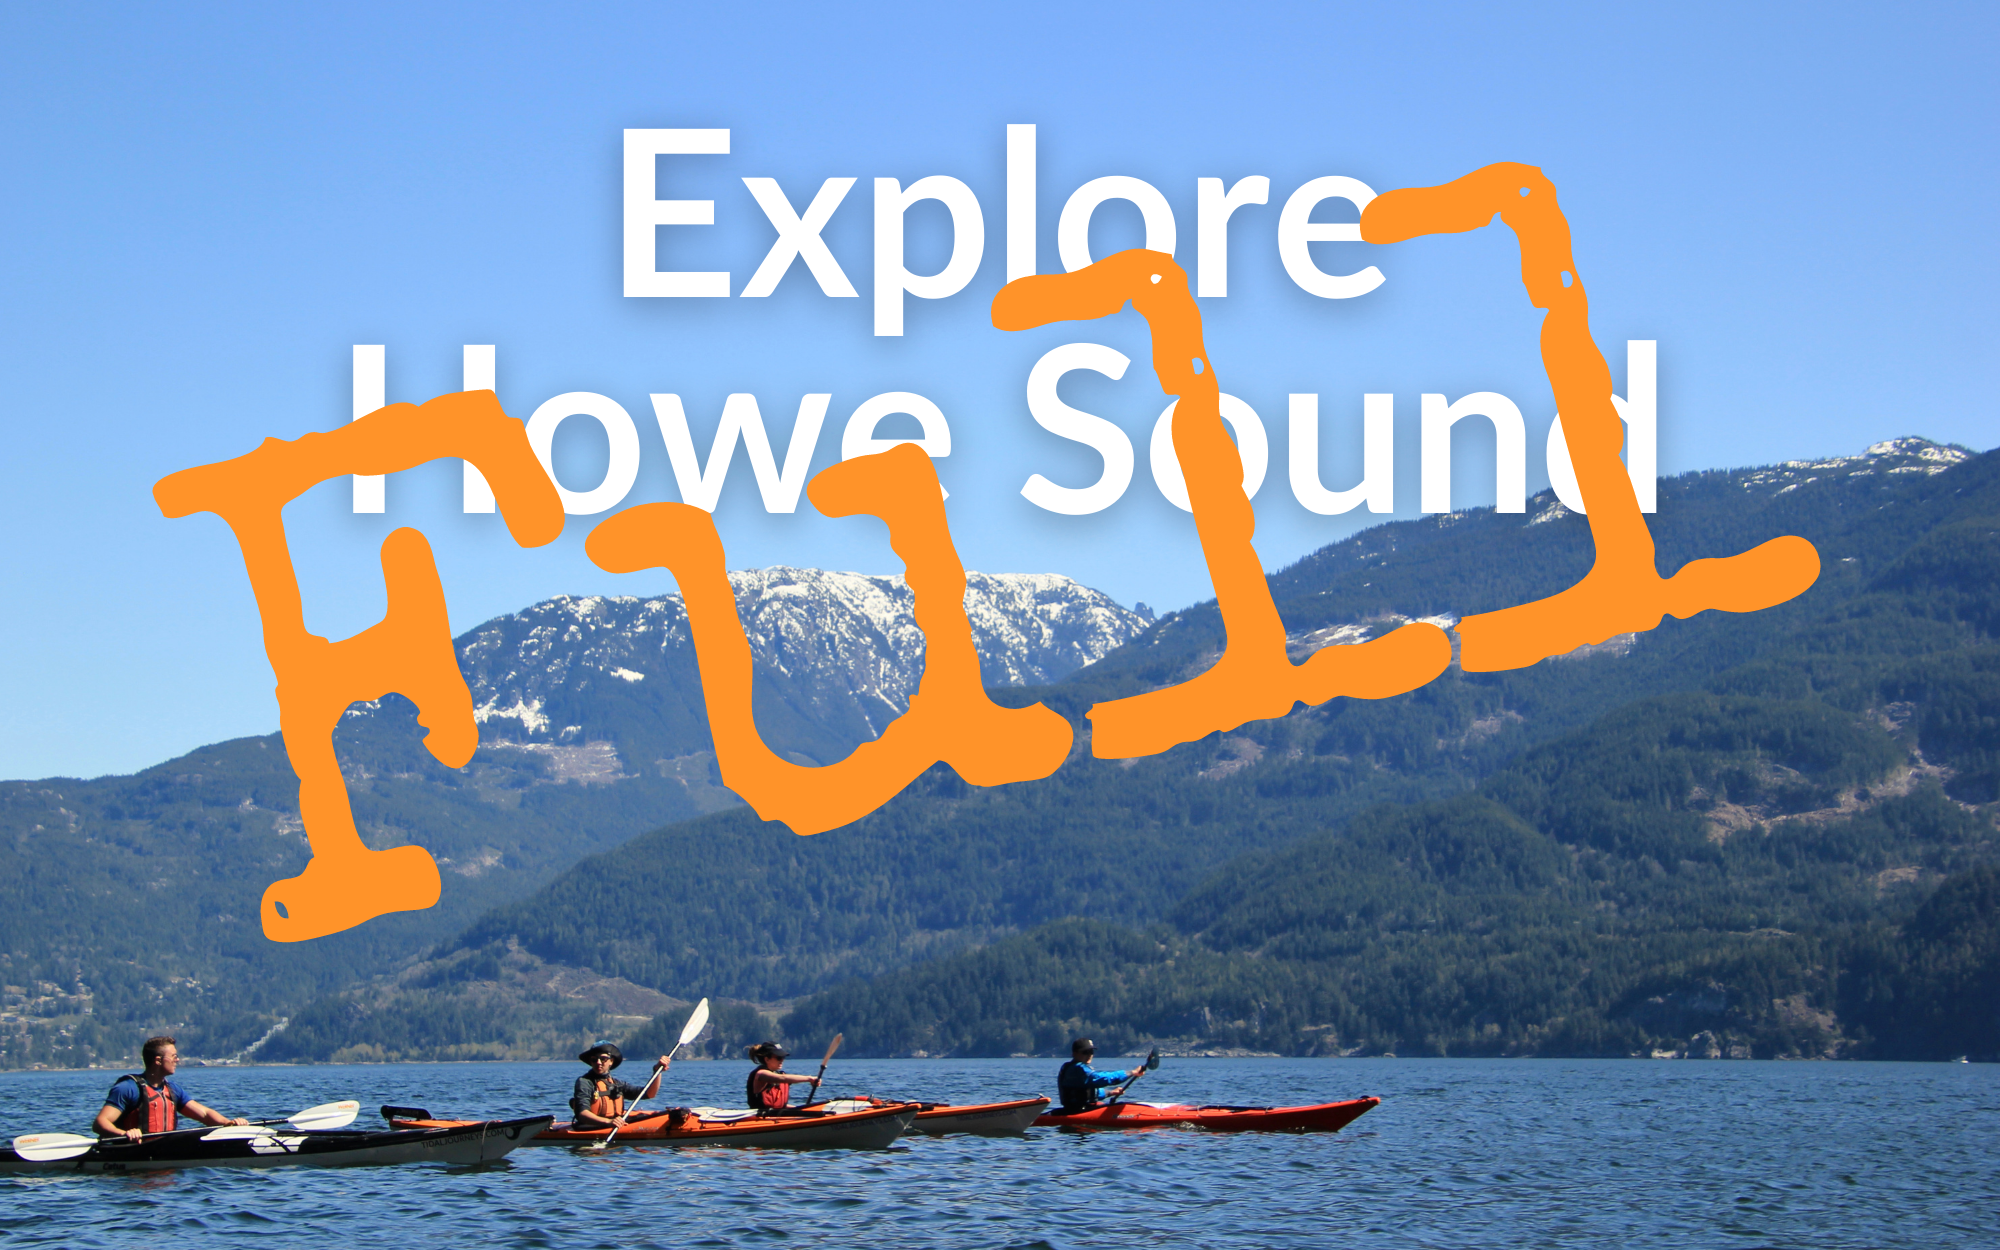 Explore Howe Sound by Kayak